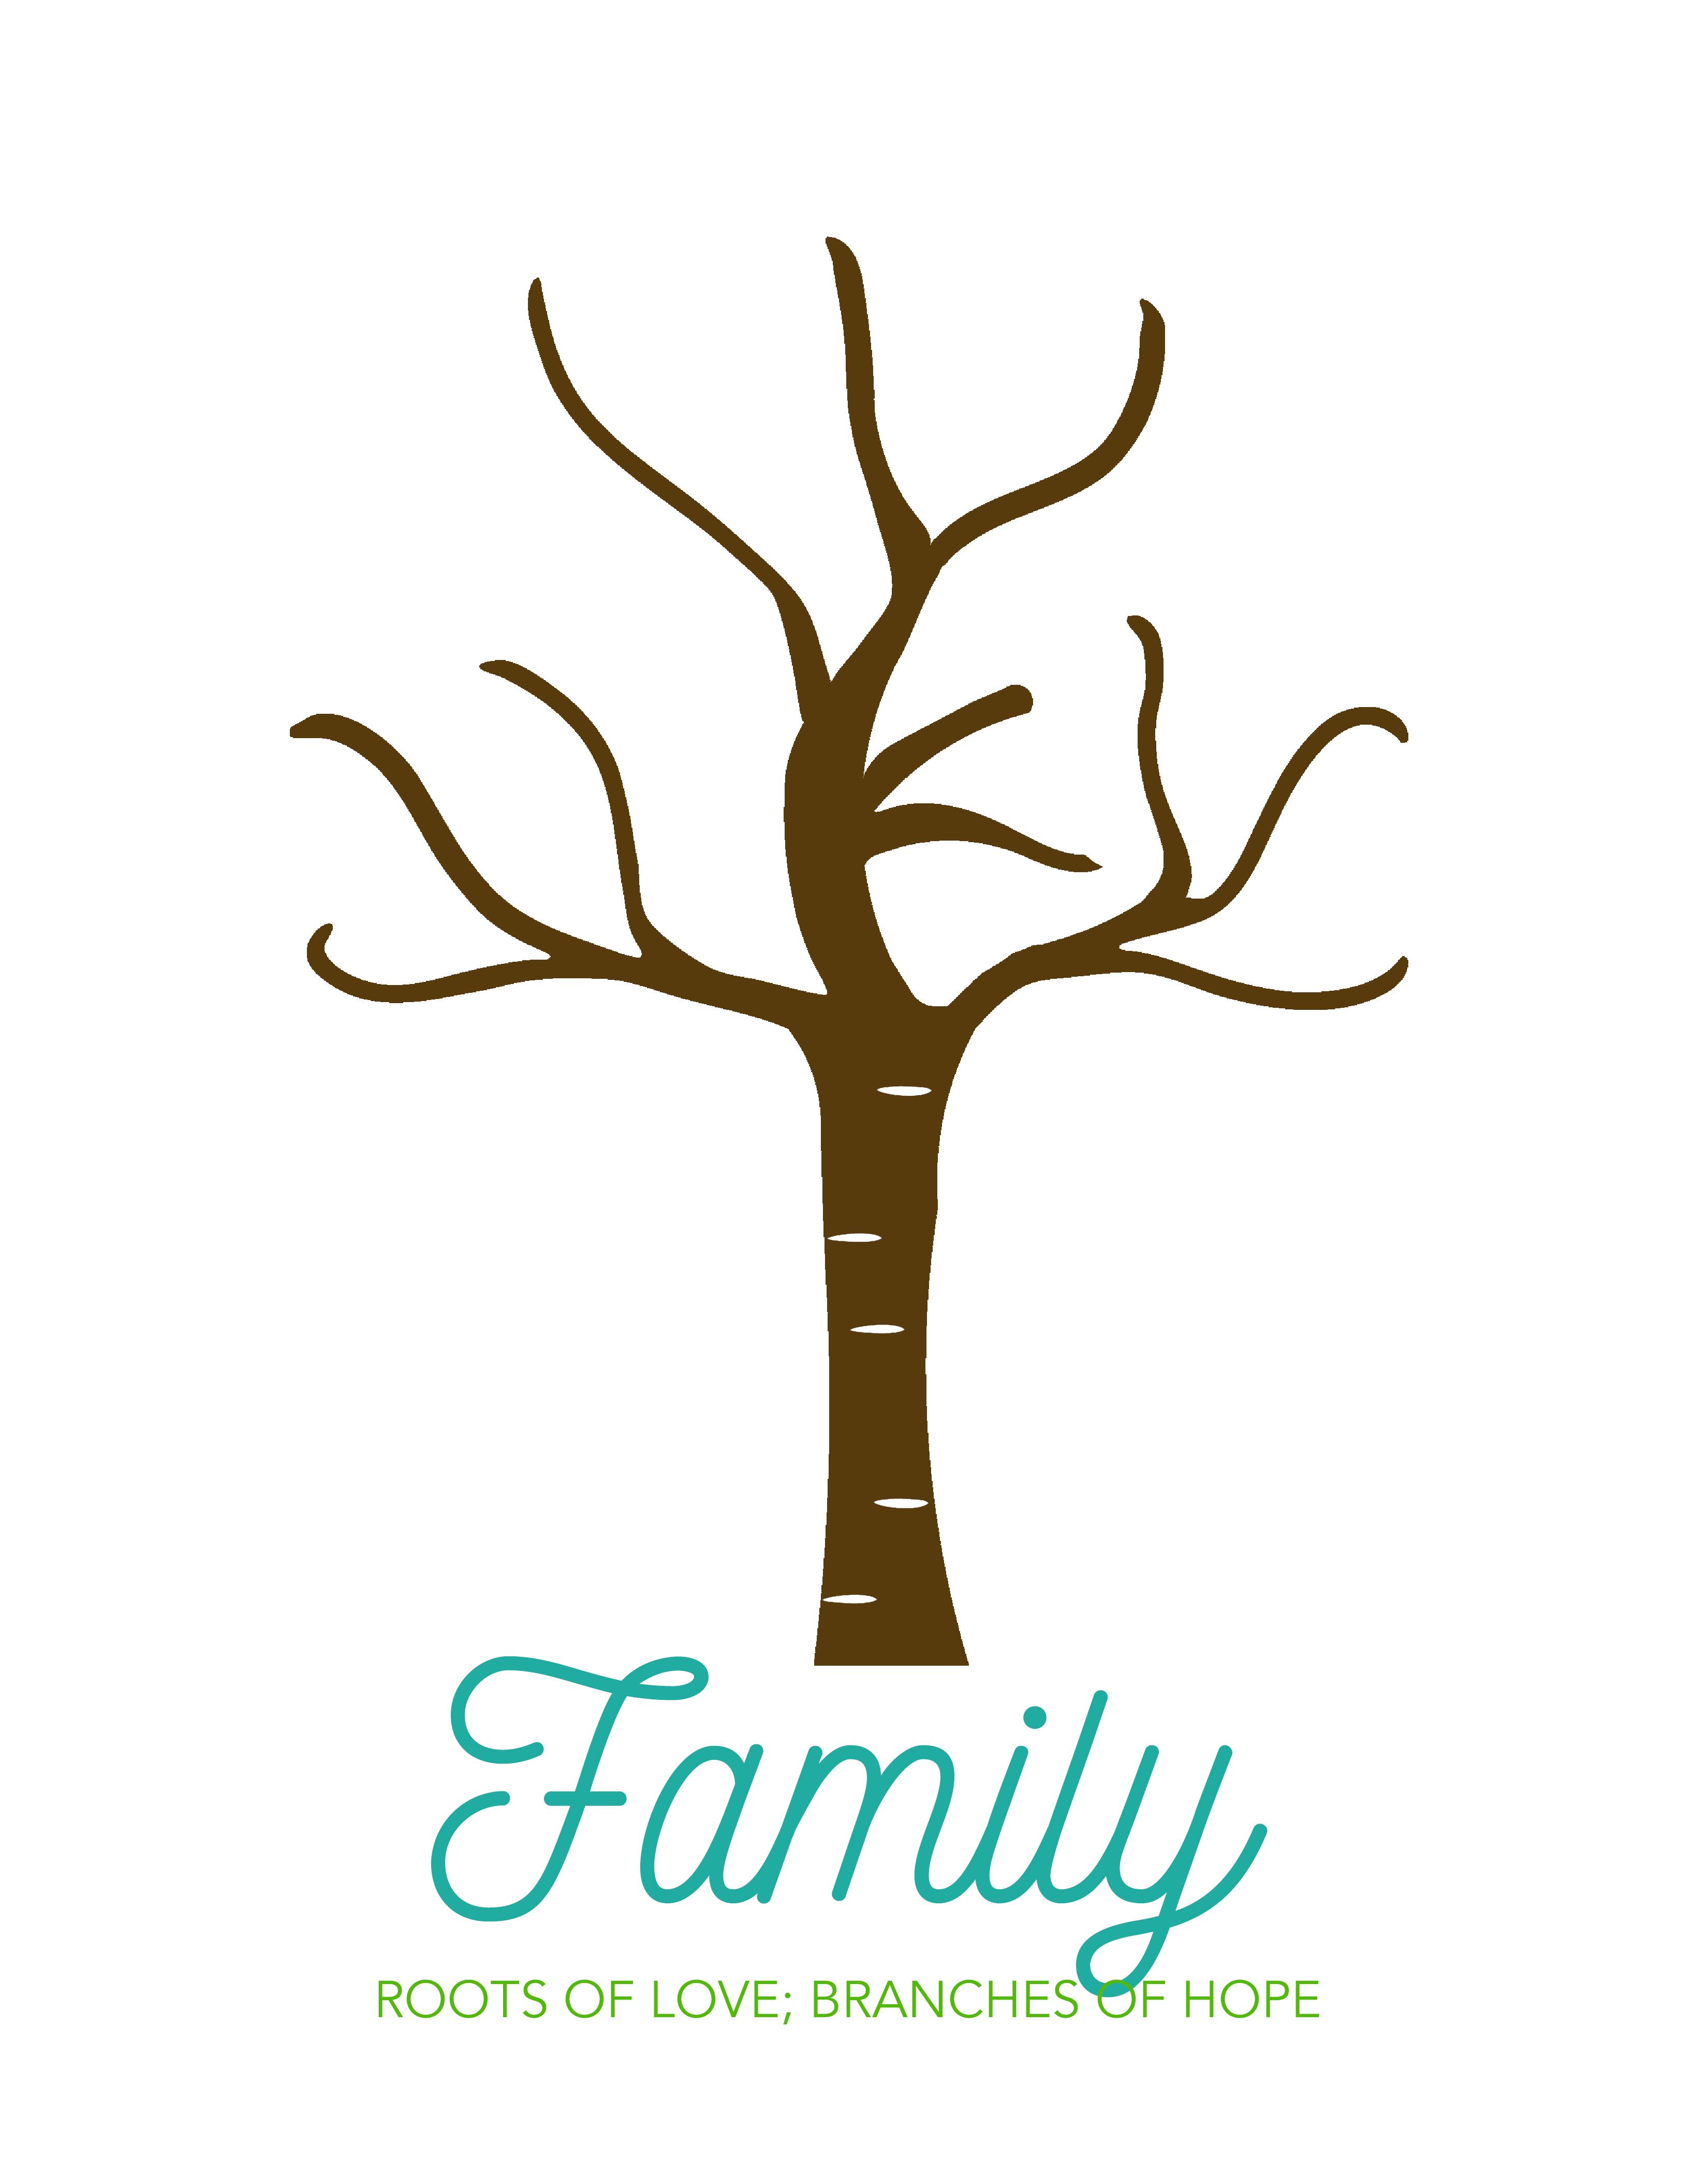 Handprint clipart family handprint. Make an adorable tree